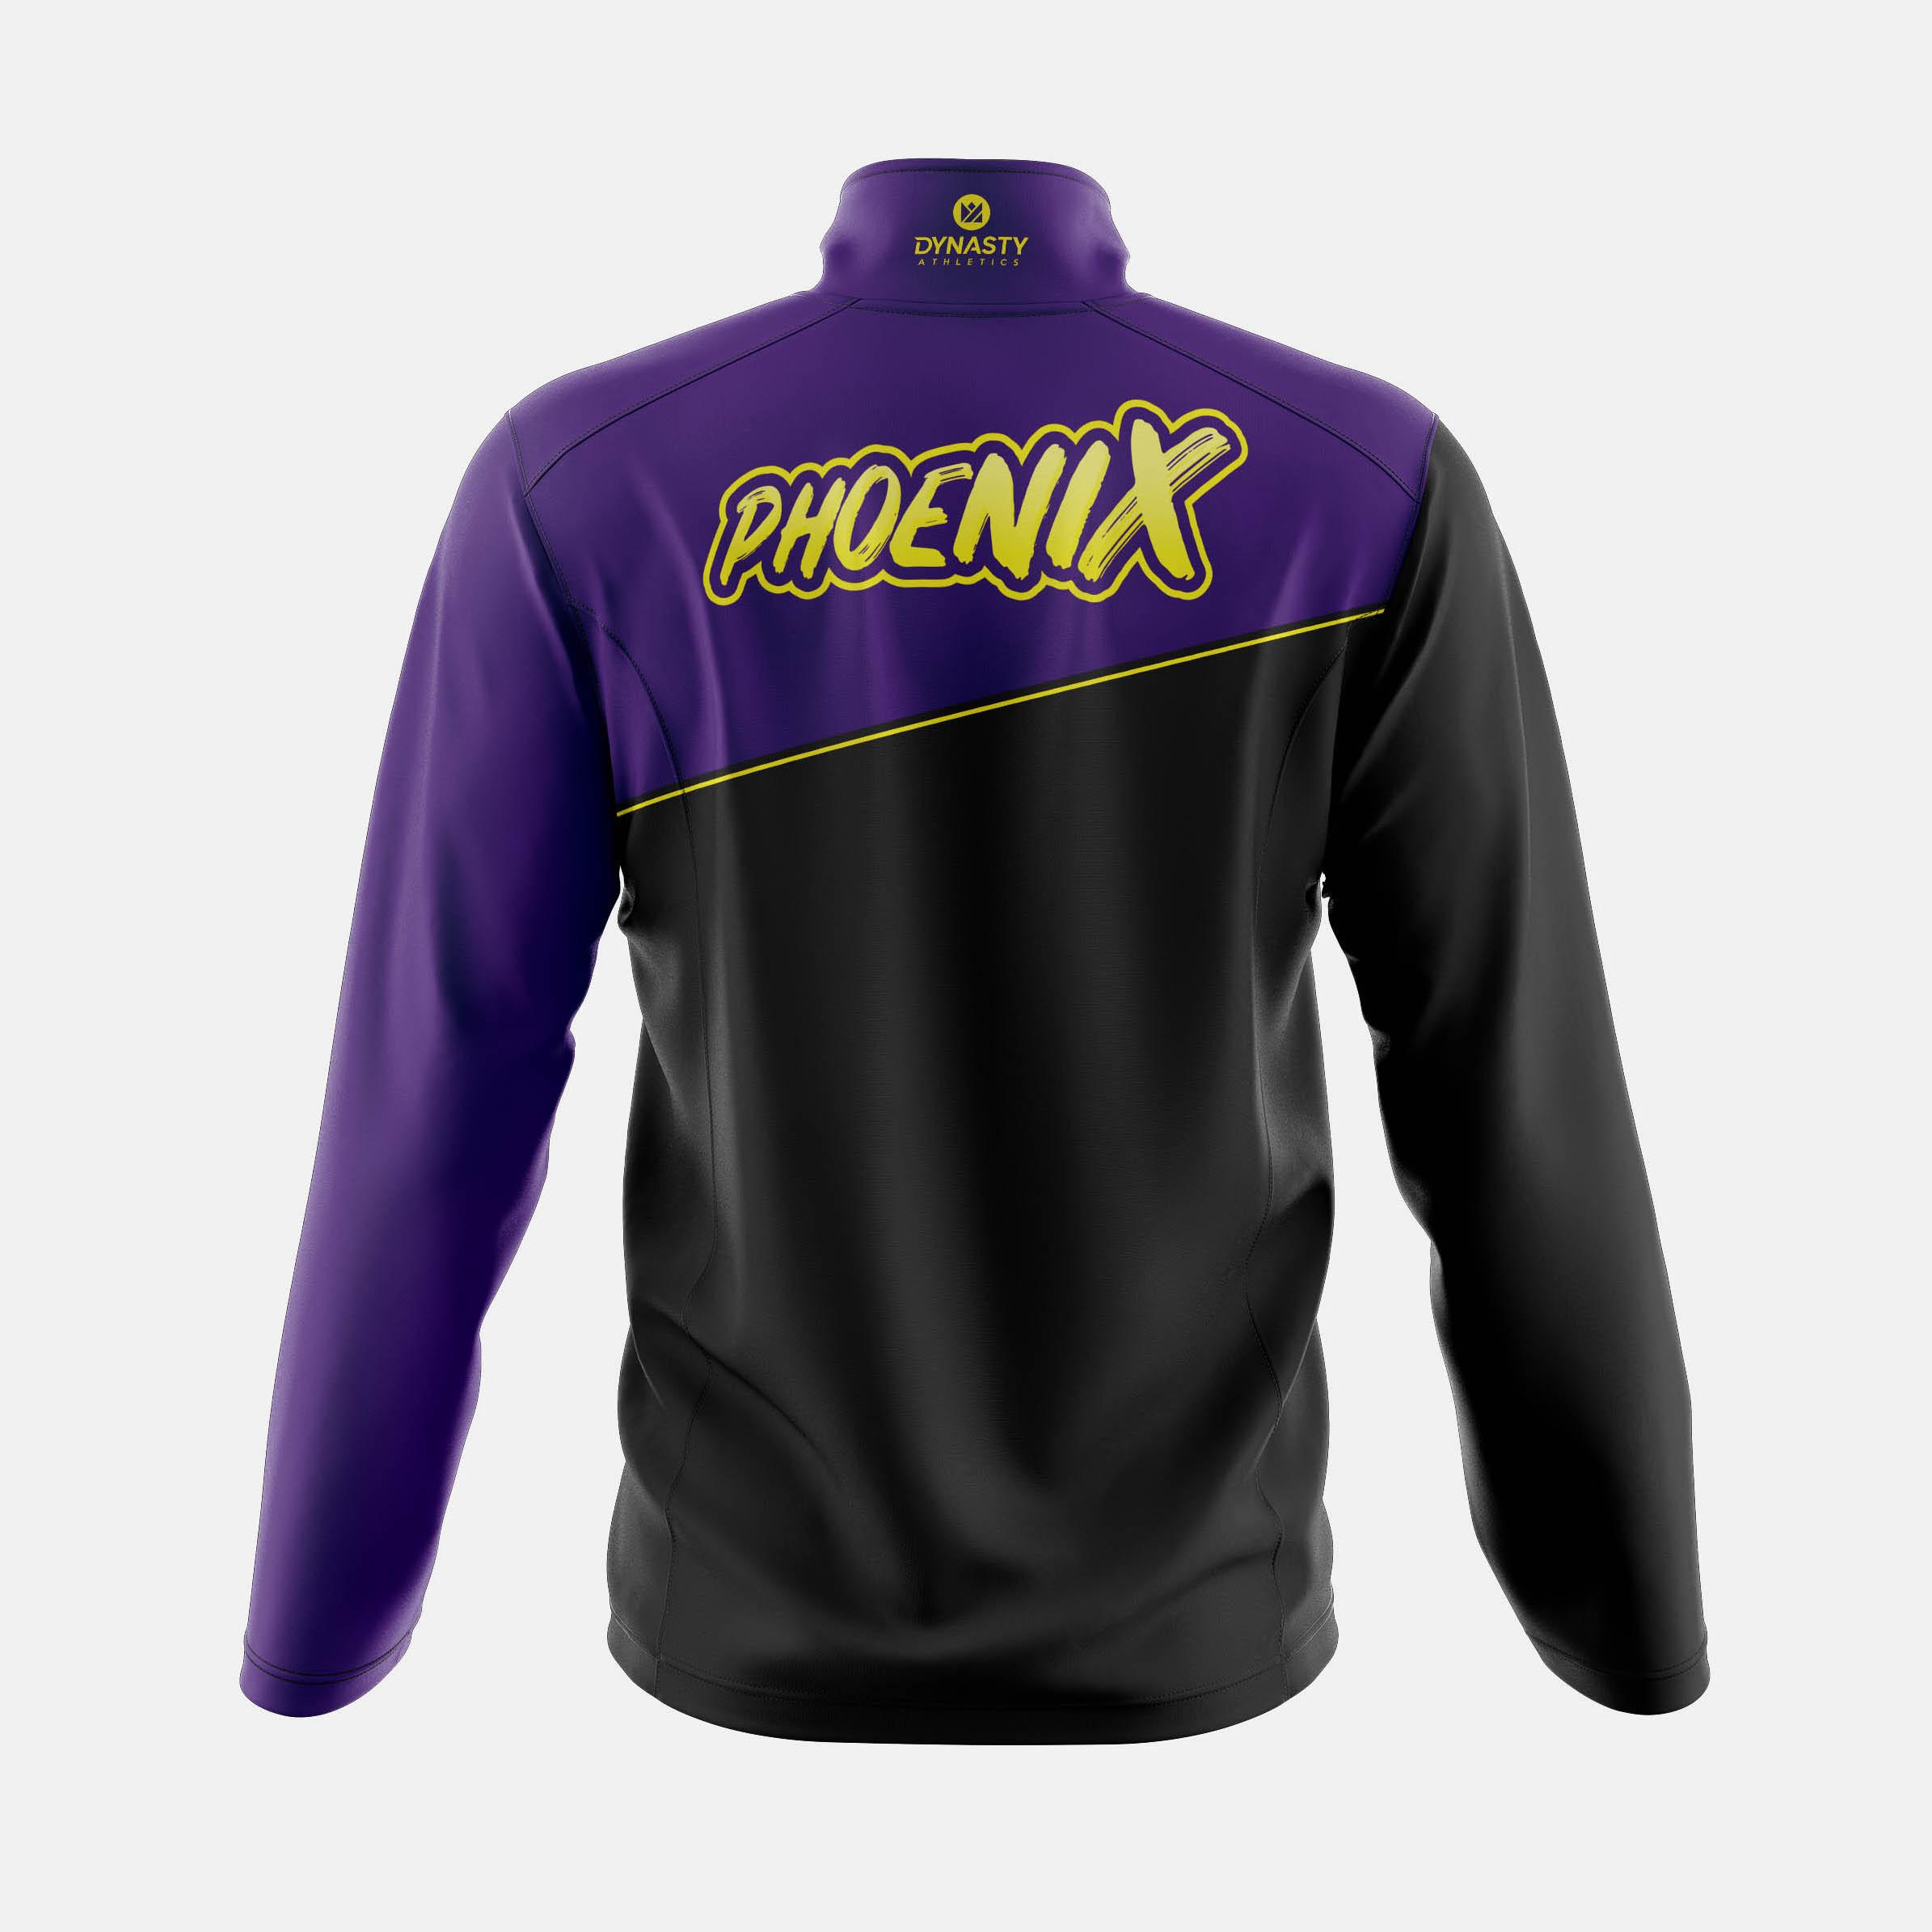 Phoenix Qtr Zip Tack Jacket Back View